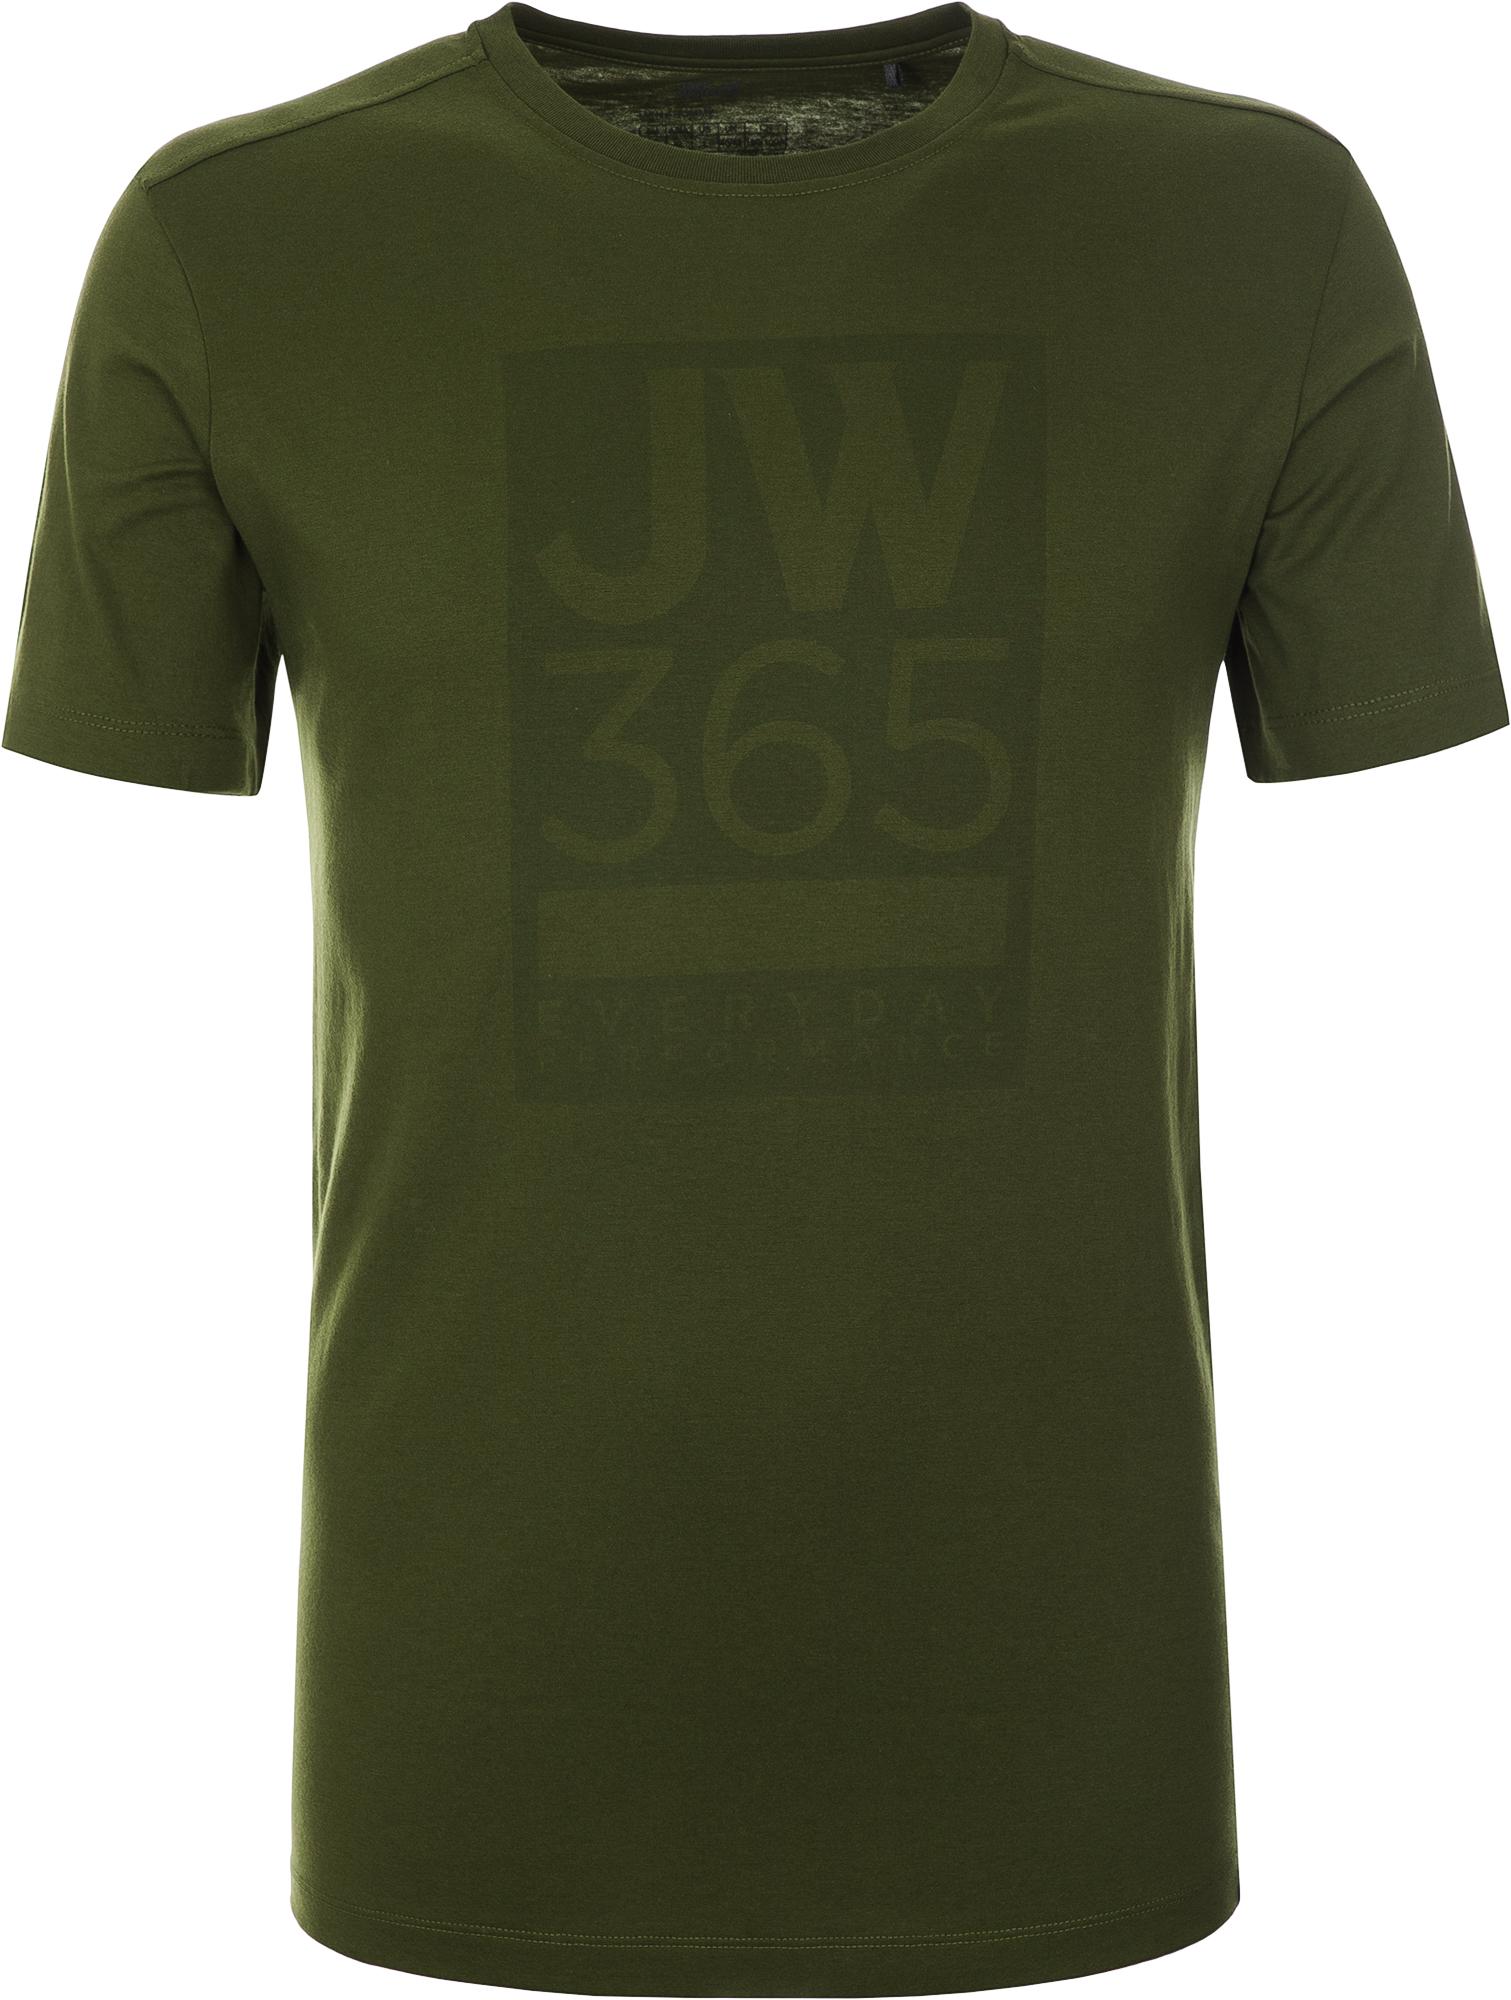 купить JACK WOLFSKIN Футболка мужская JACK WOLFSKIN Wolfskin 365, размер 54-56 по цене 1749 рублей